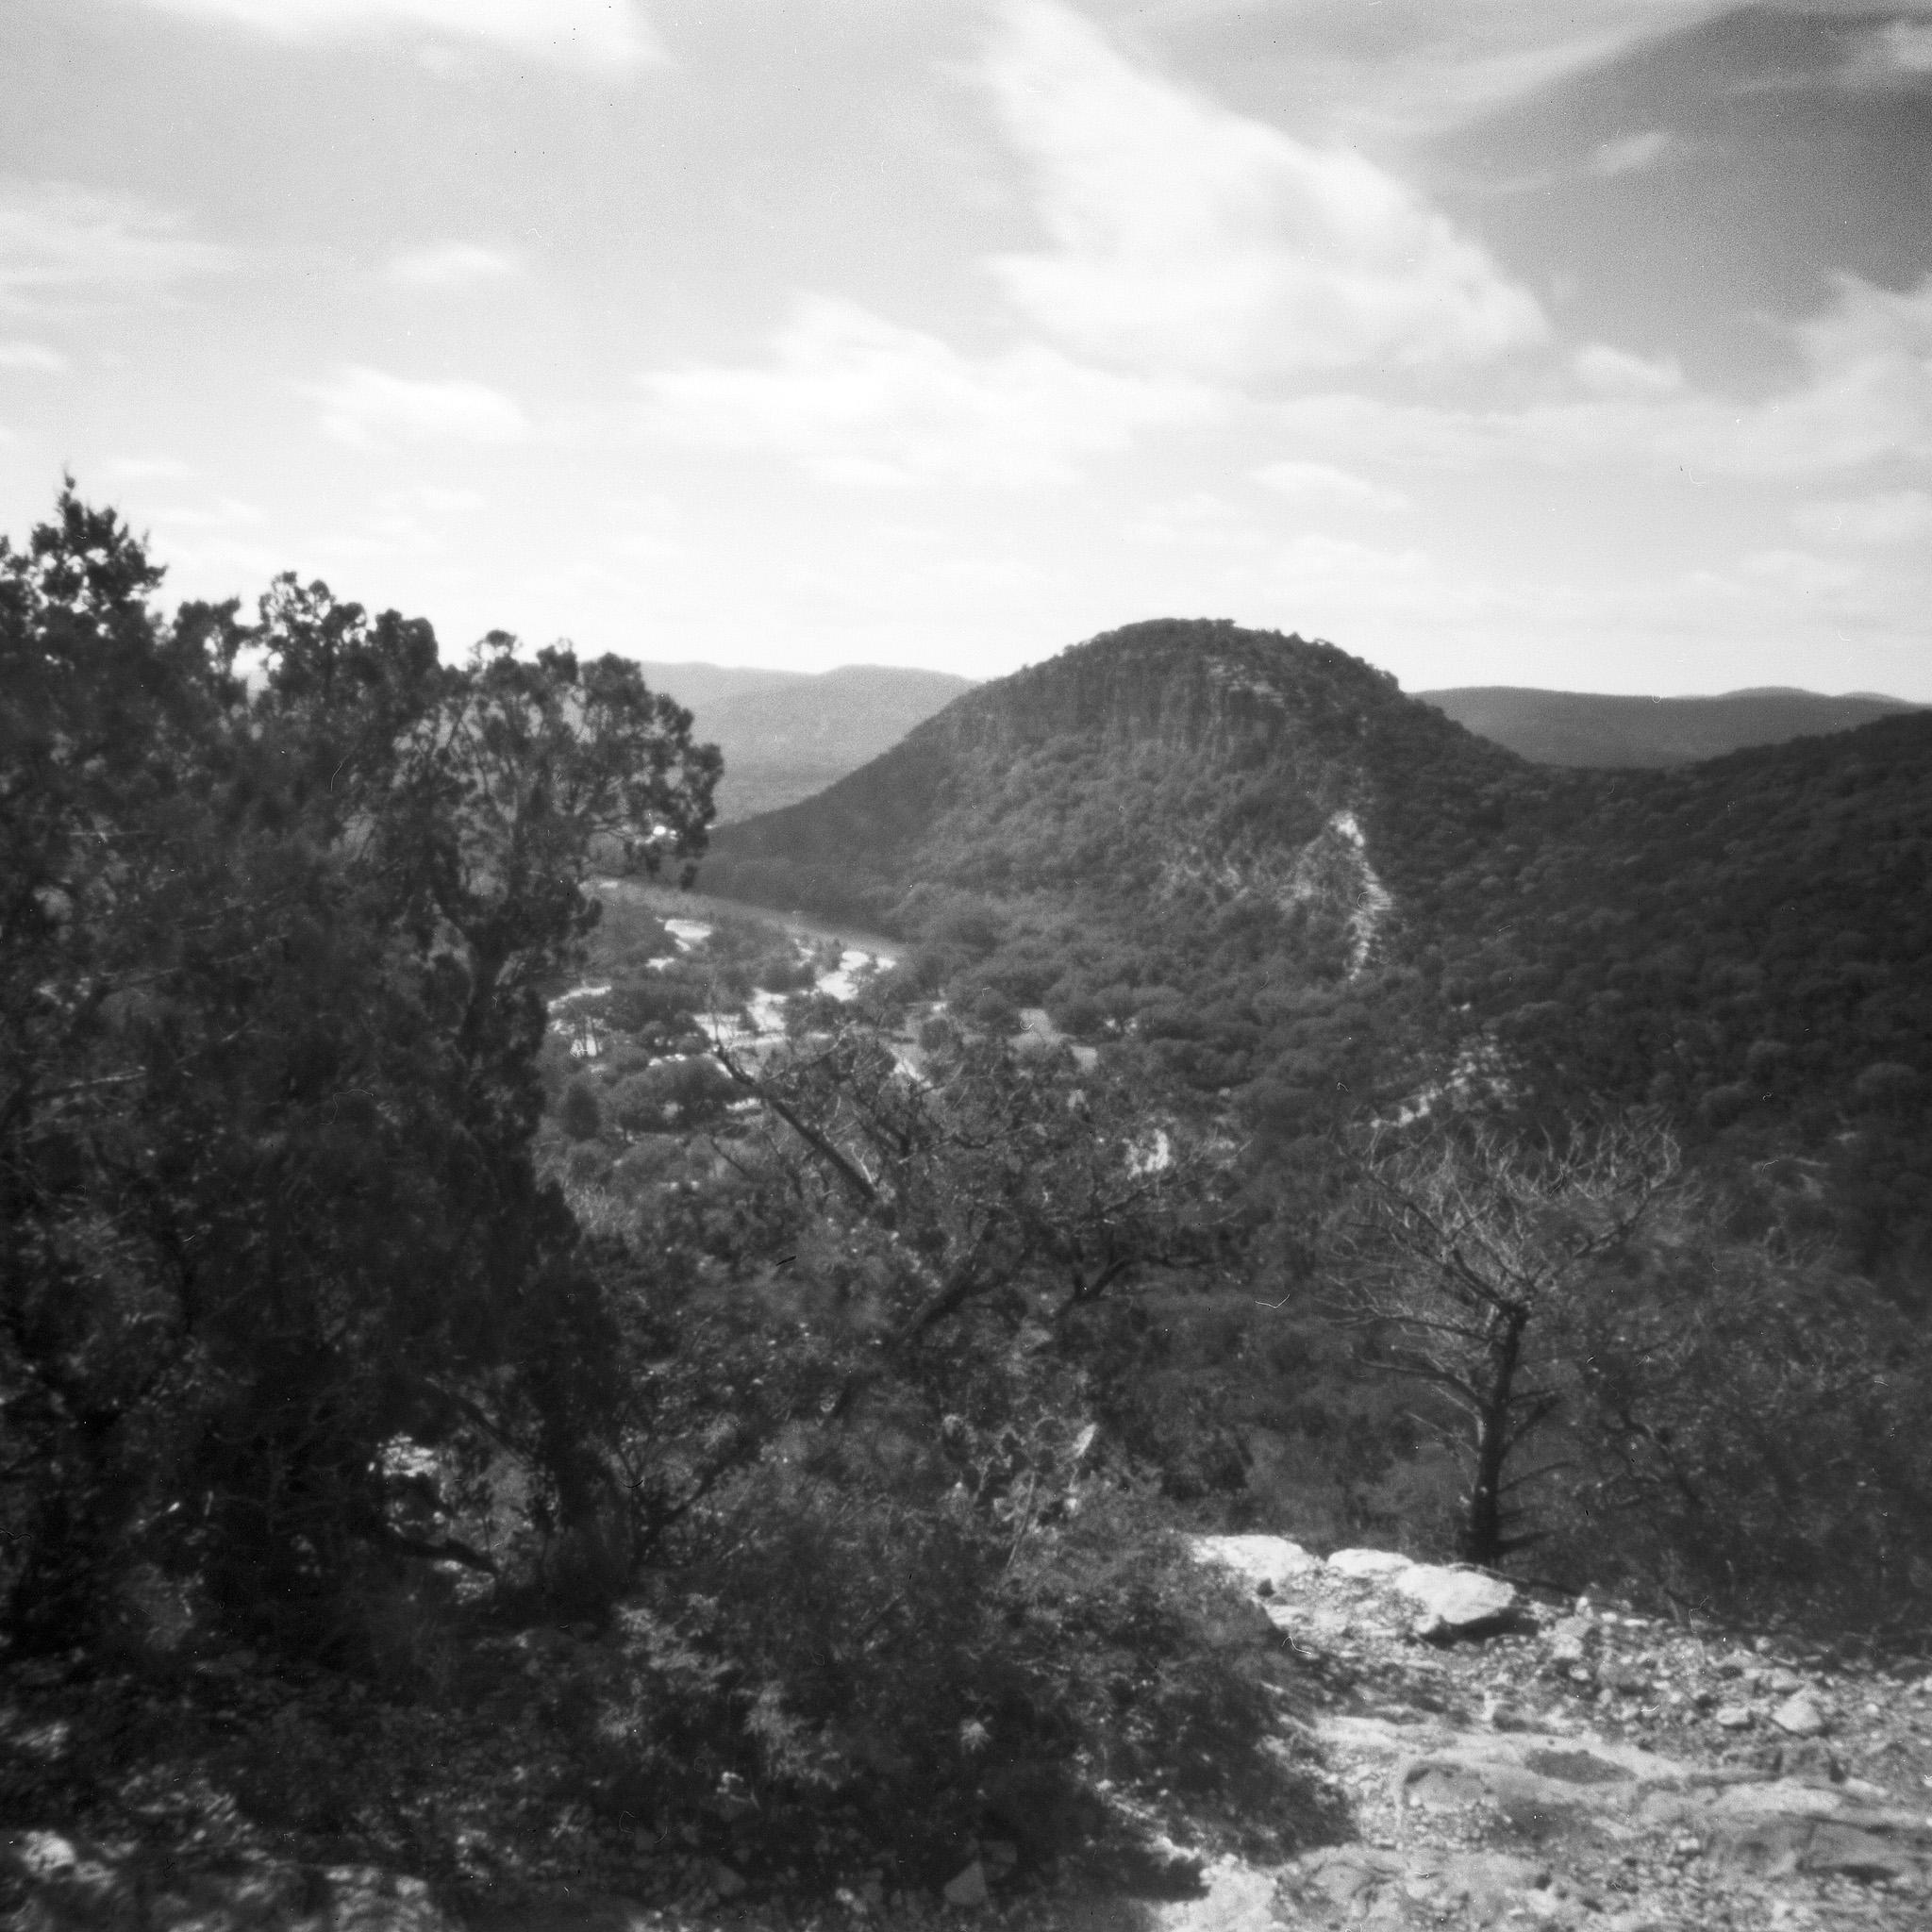 charles henry - garner state park black white mountain landscape ipad wallpaper